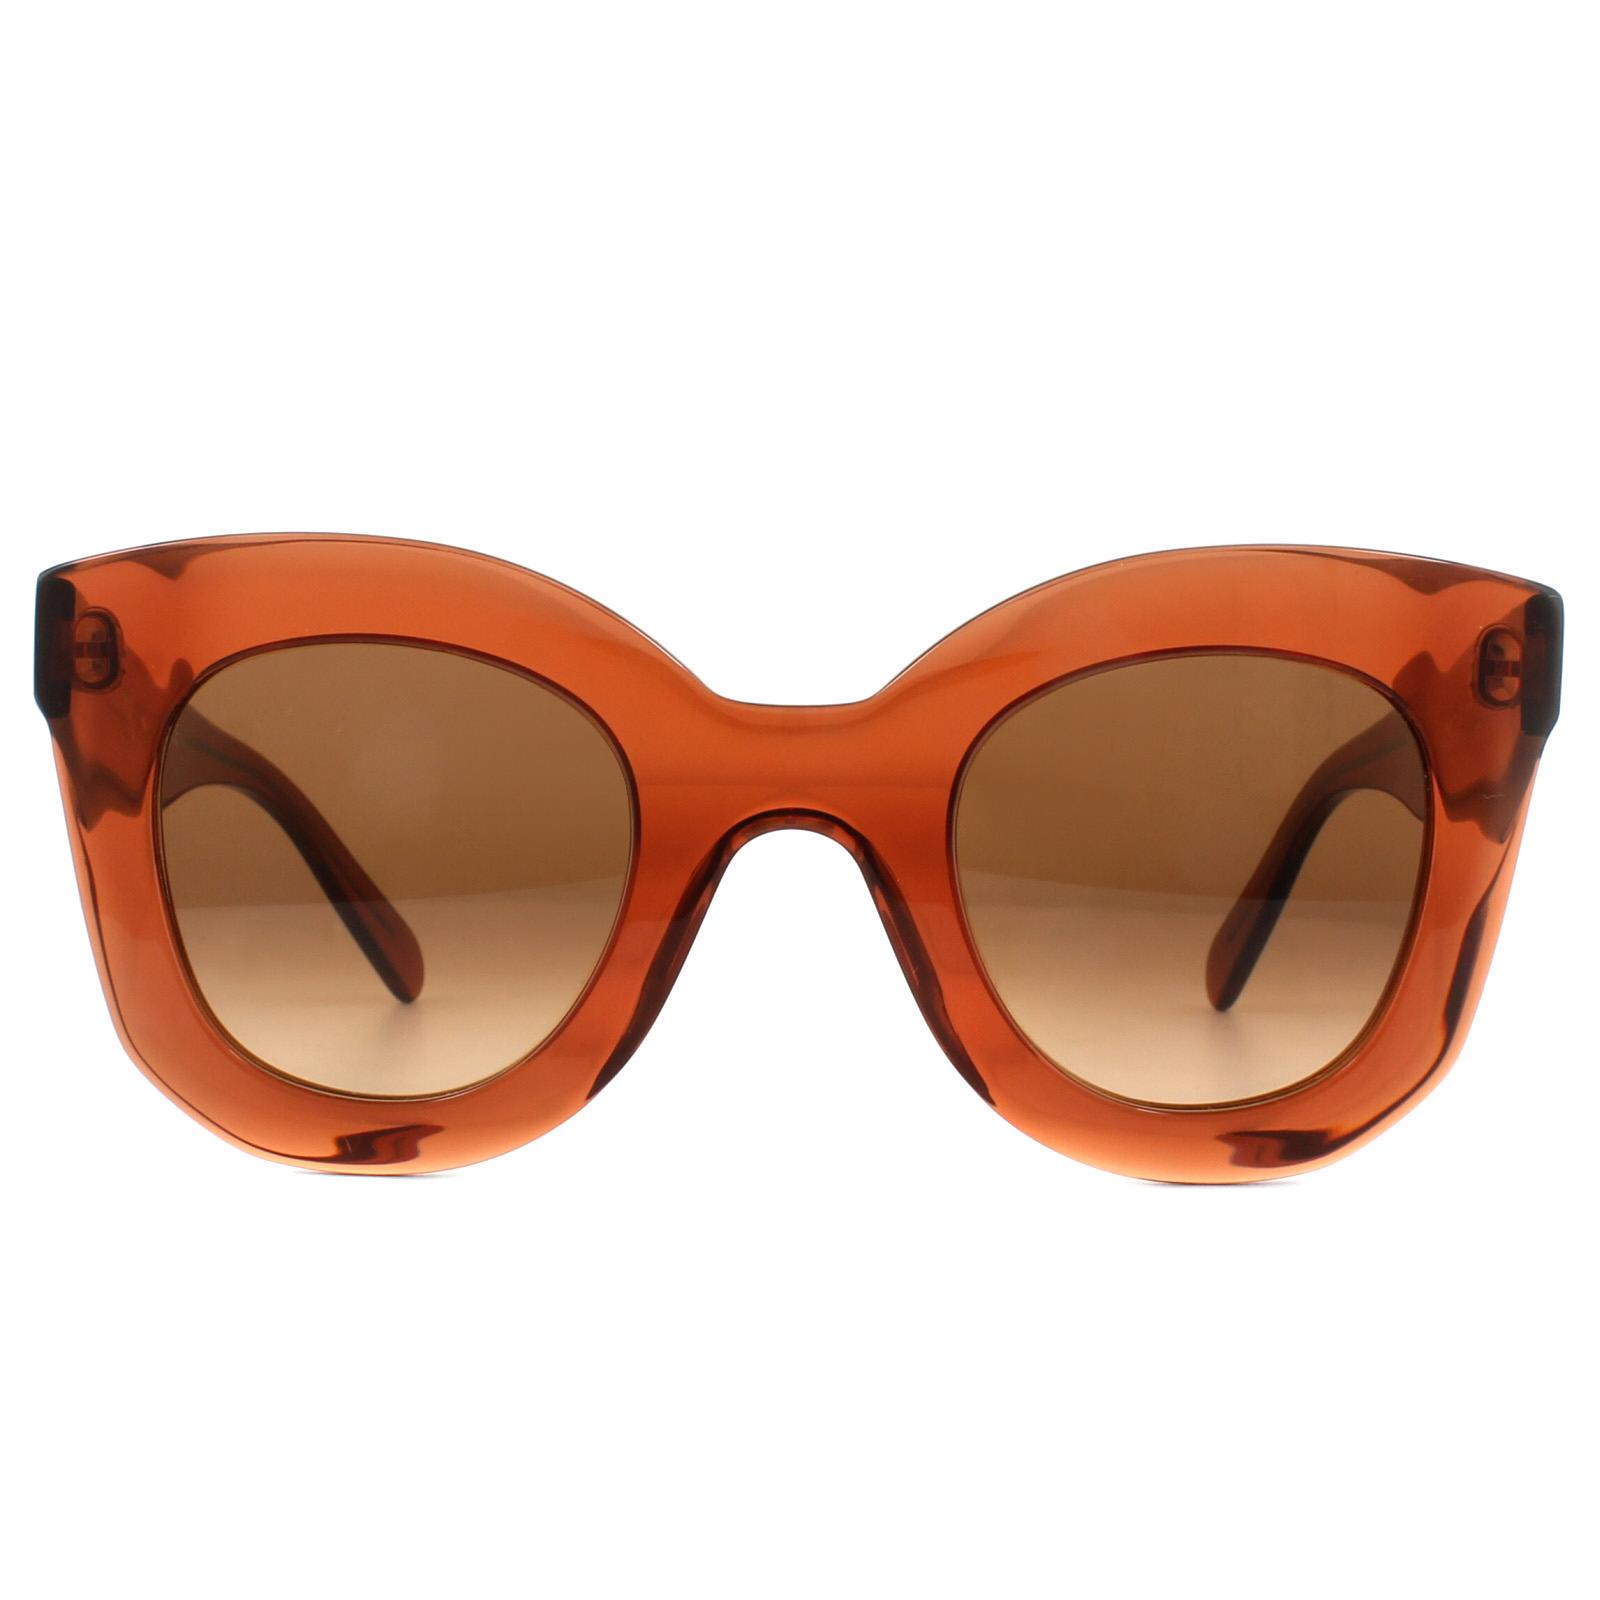 b555cdf8a0fc Sentinel Celine Sunglasses 41393S Baby Marta EFB PP Dark Orange Brown  Gradient